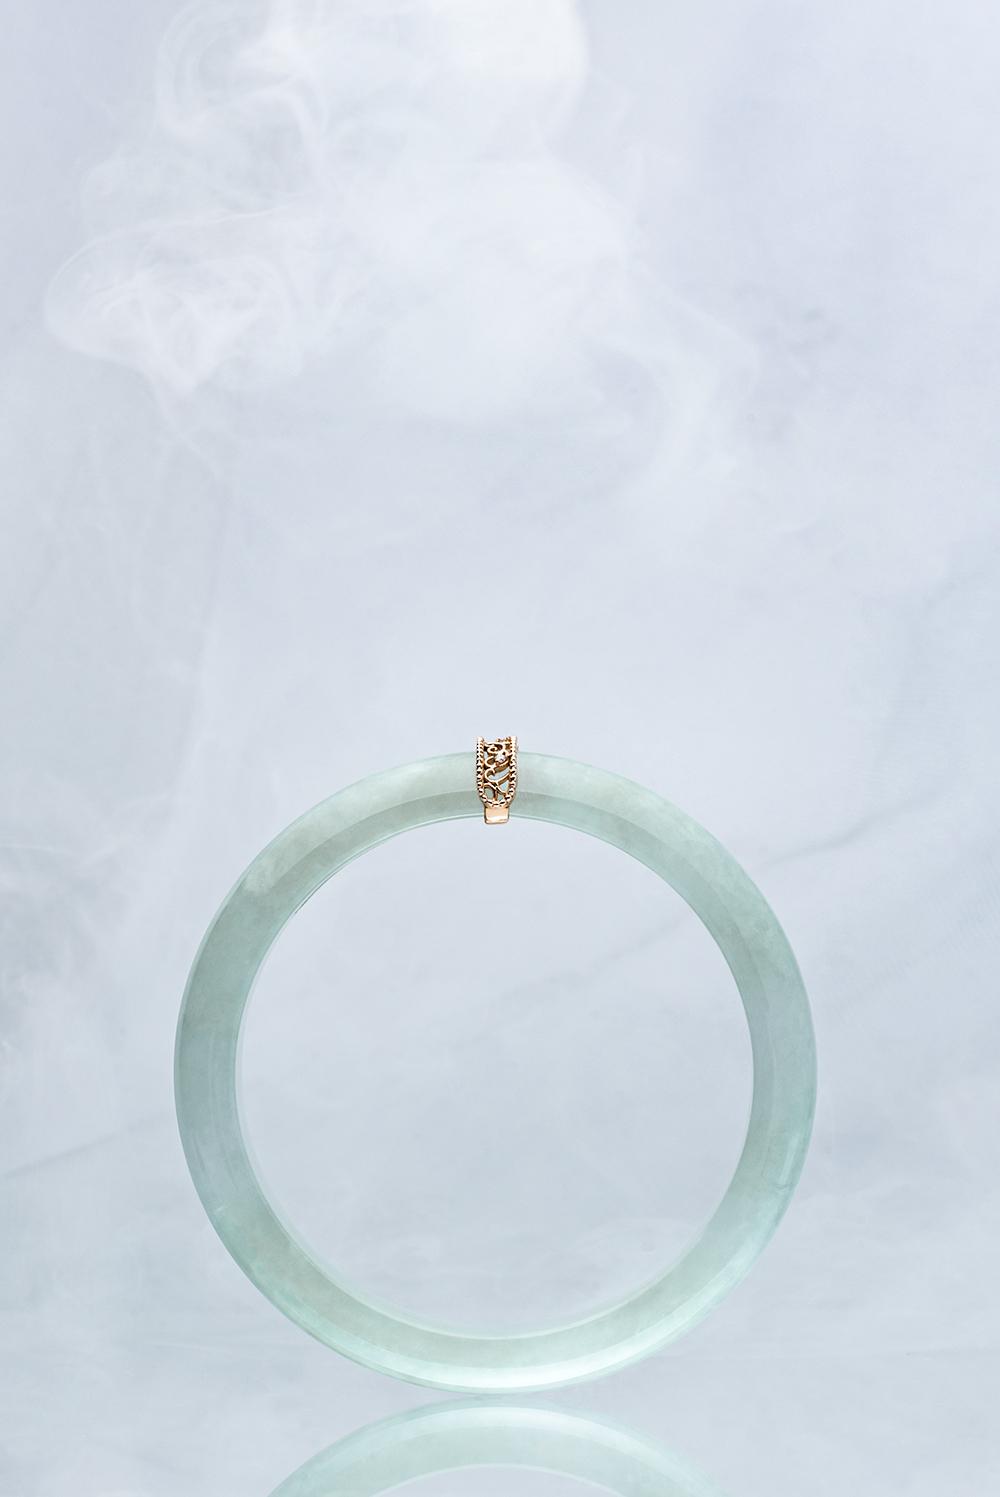 Lunar Jade Collection: World's Top 1% of Jadeite Bangles